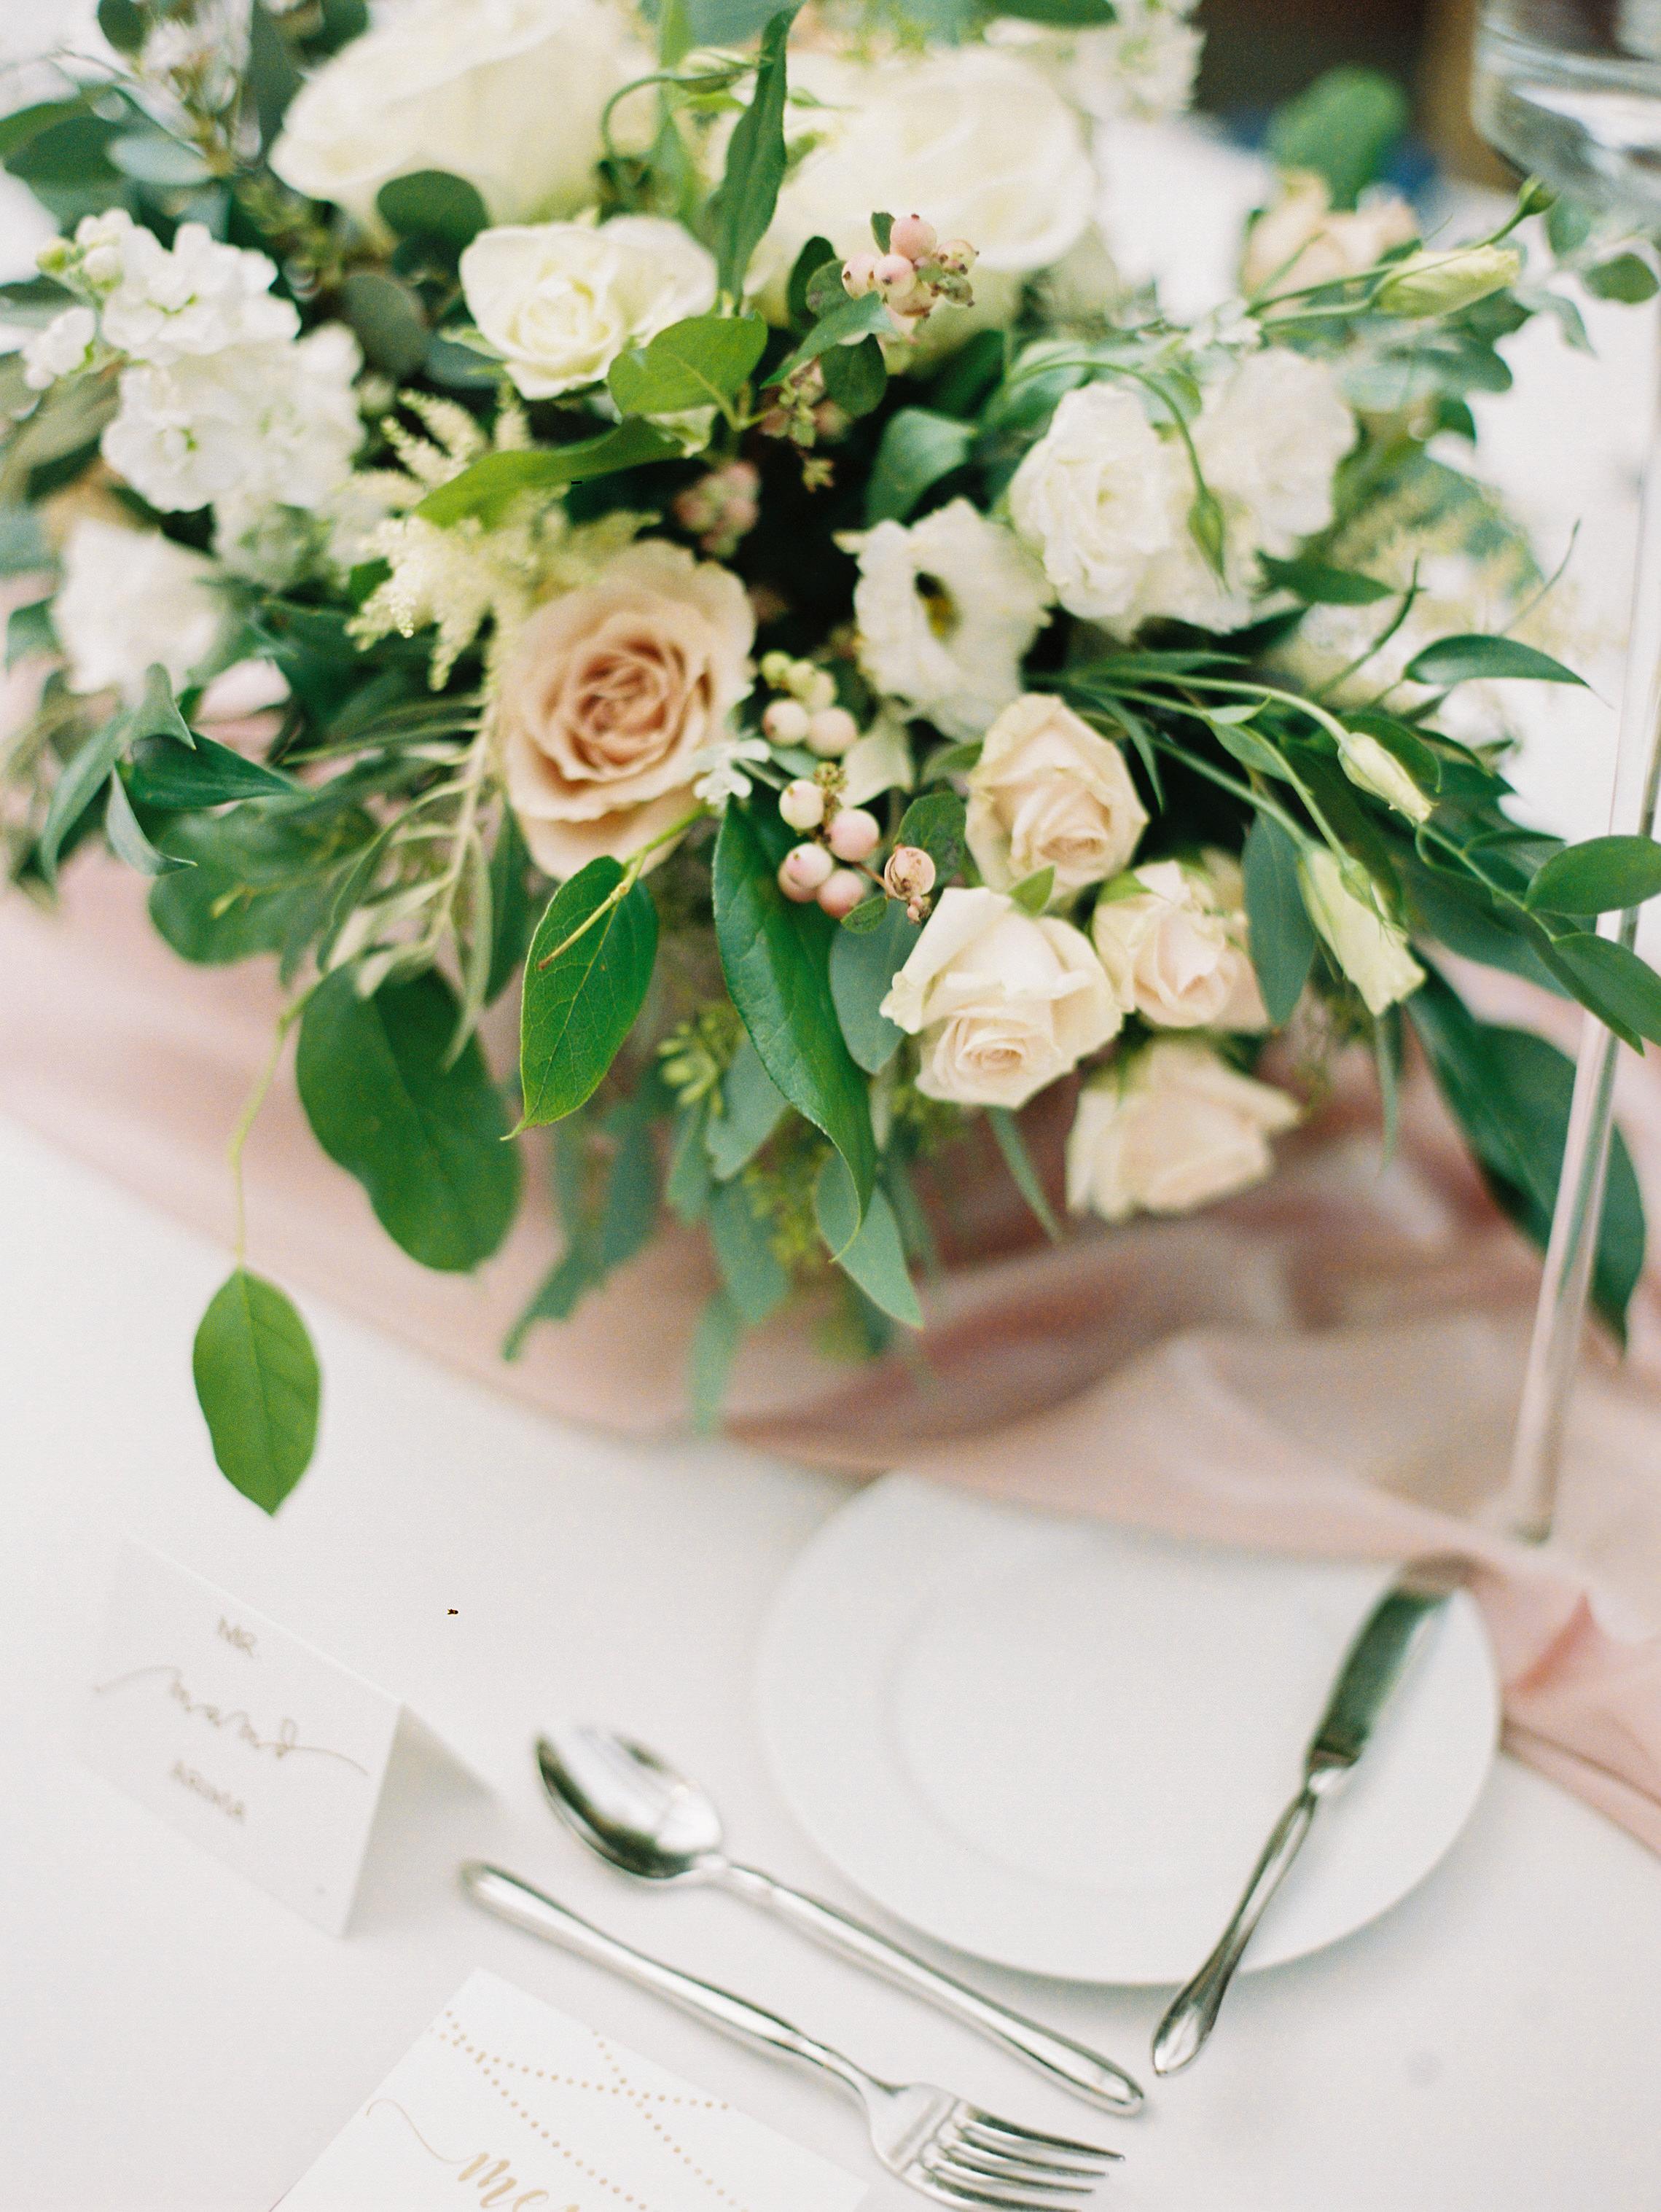 05_jukes_wedding-021.JPG